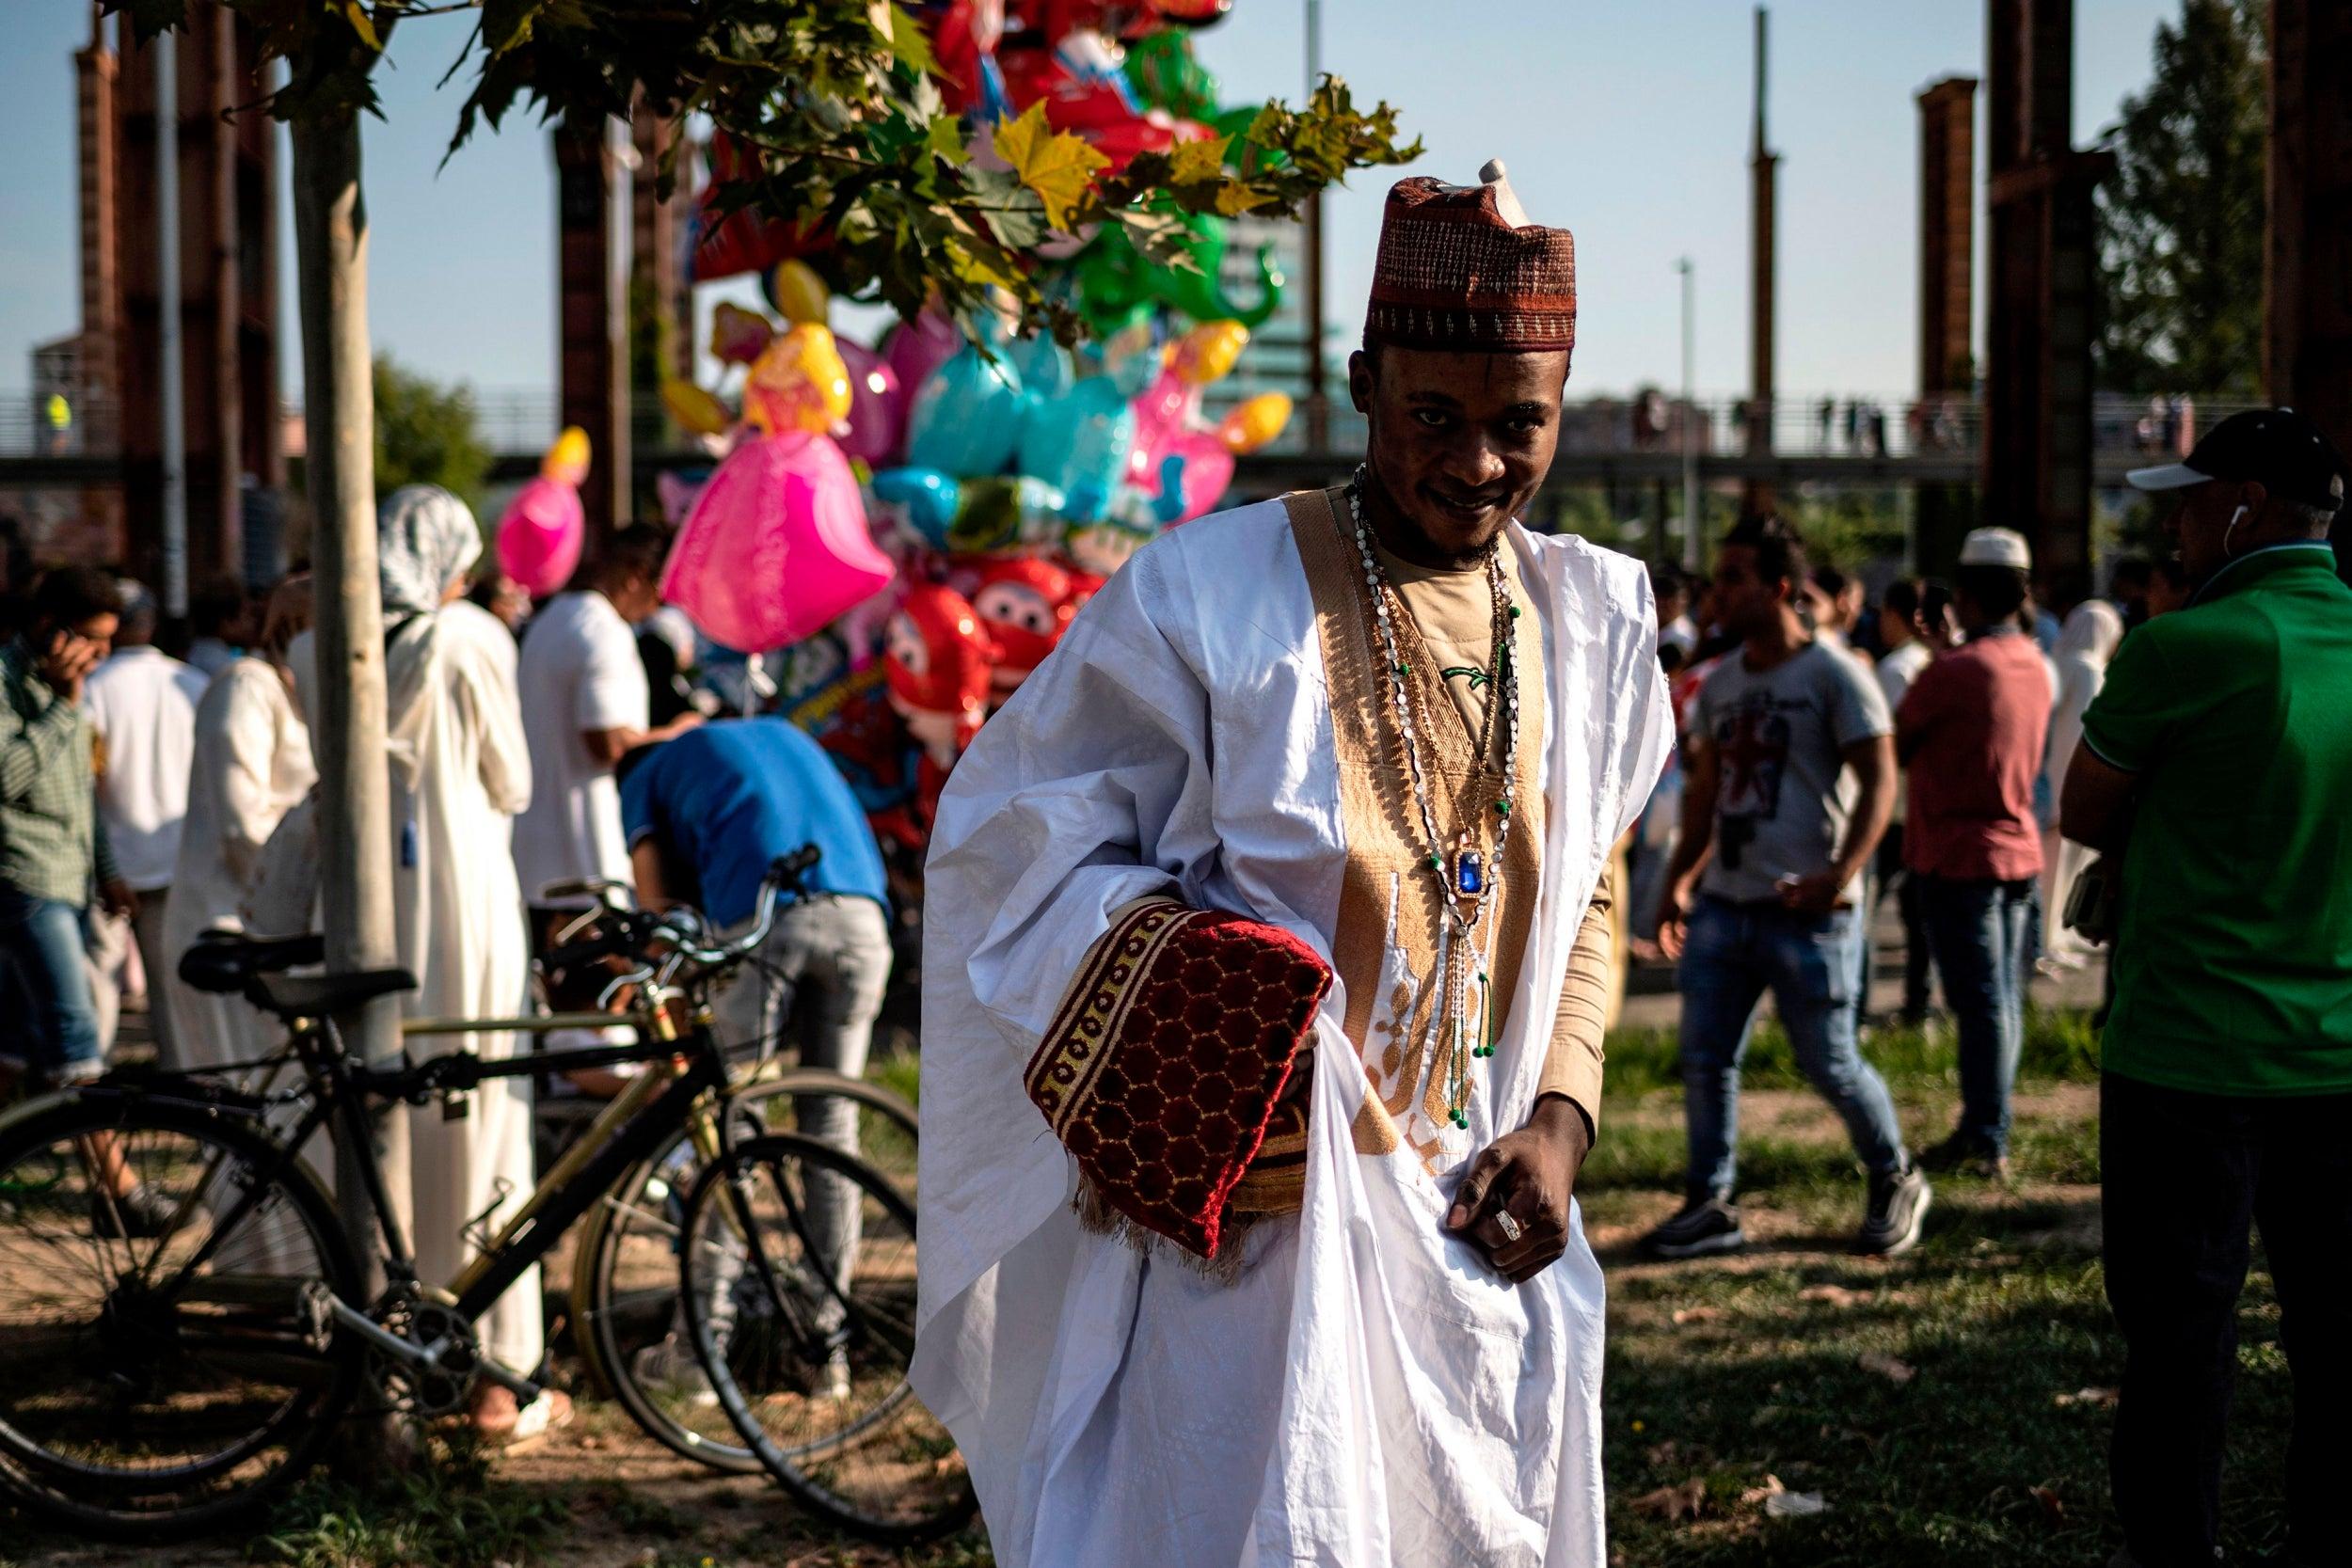 Eid al-Adha: Why do Muslims sacrifice animals and where is the